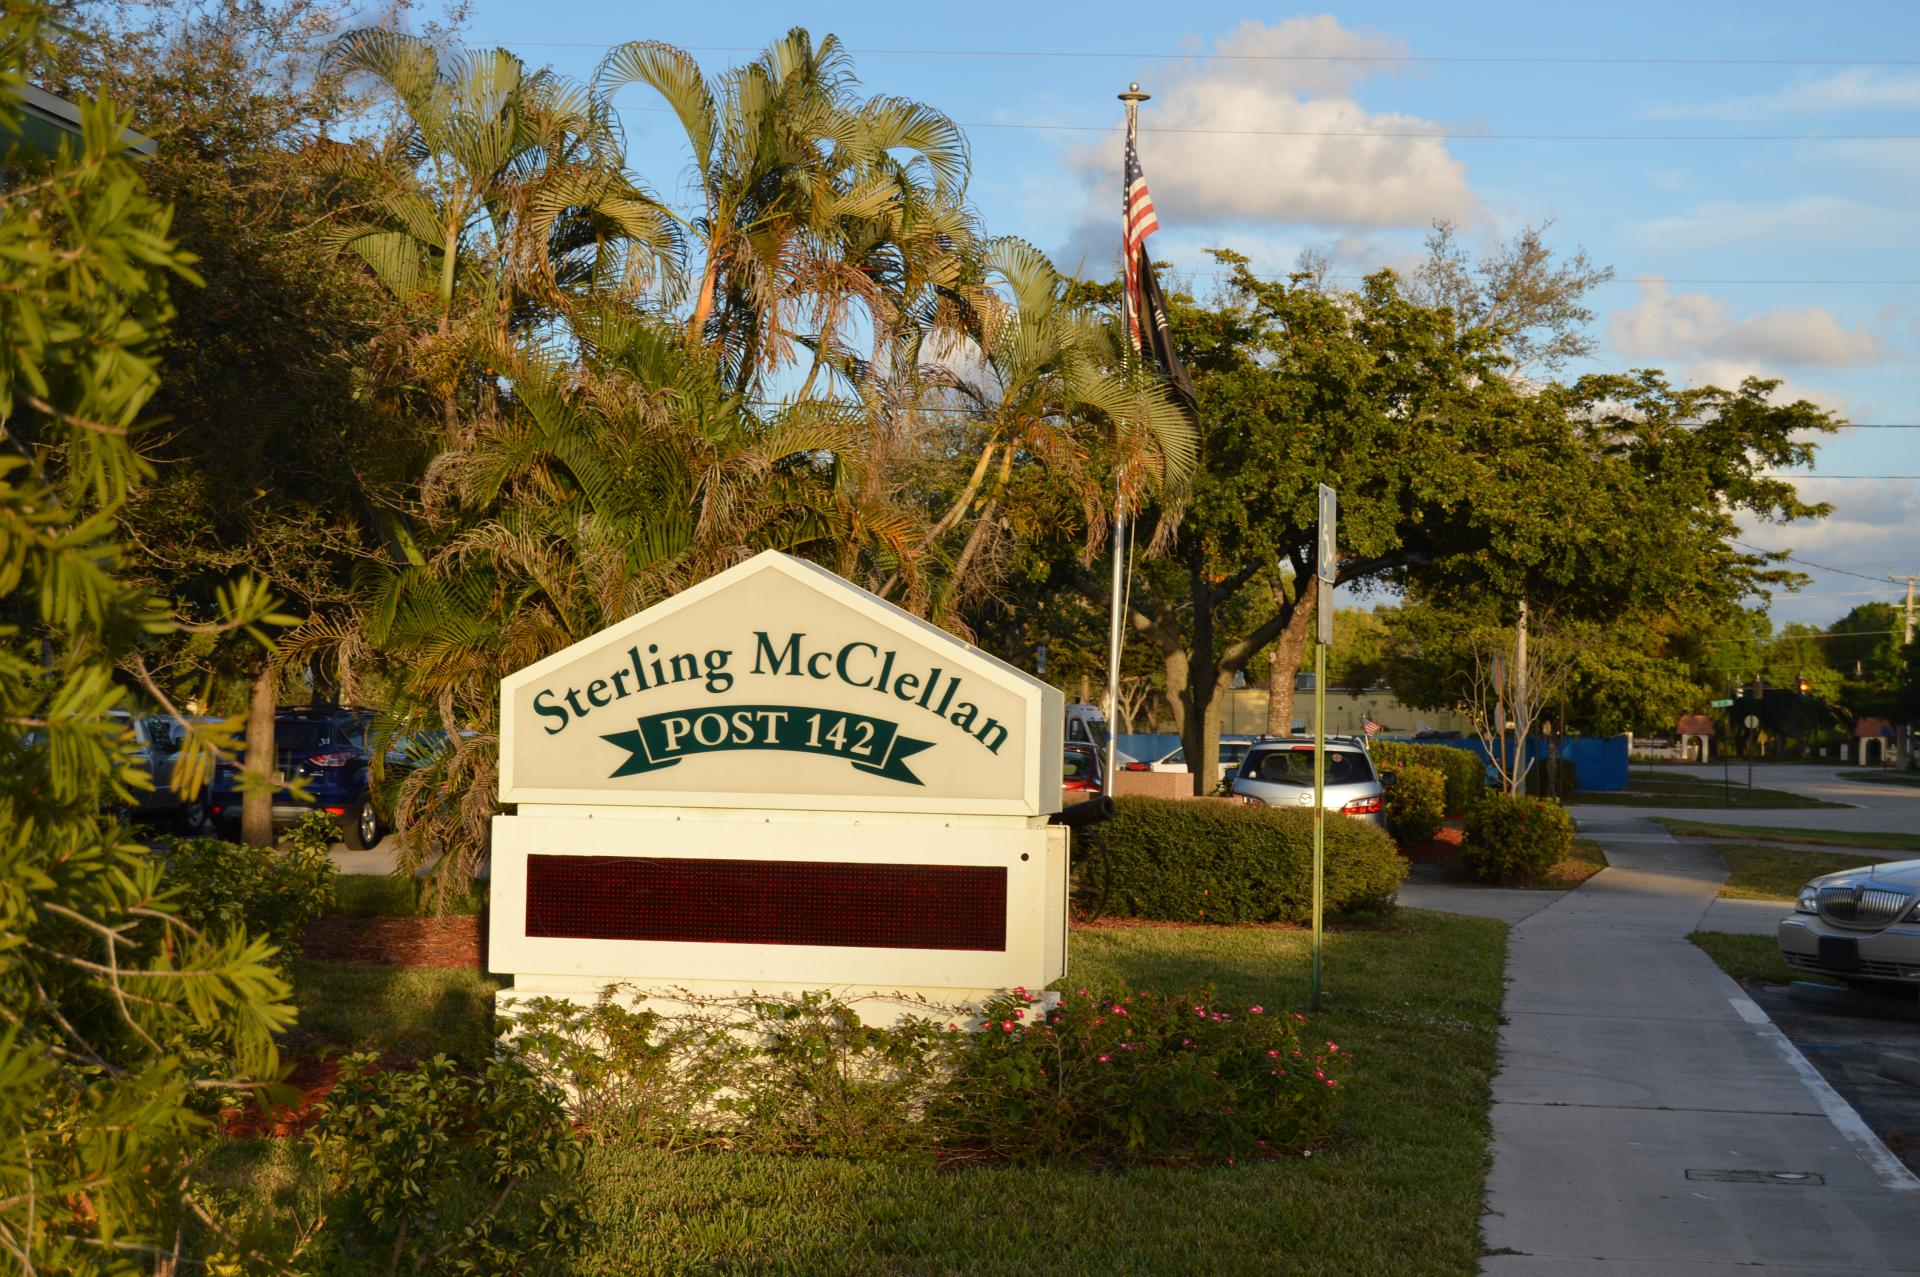 Post 142 Pompano Beach, Florida